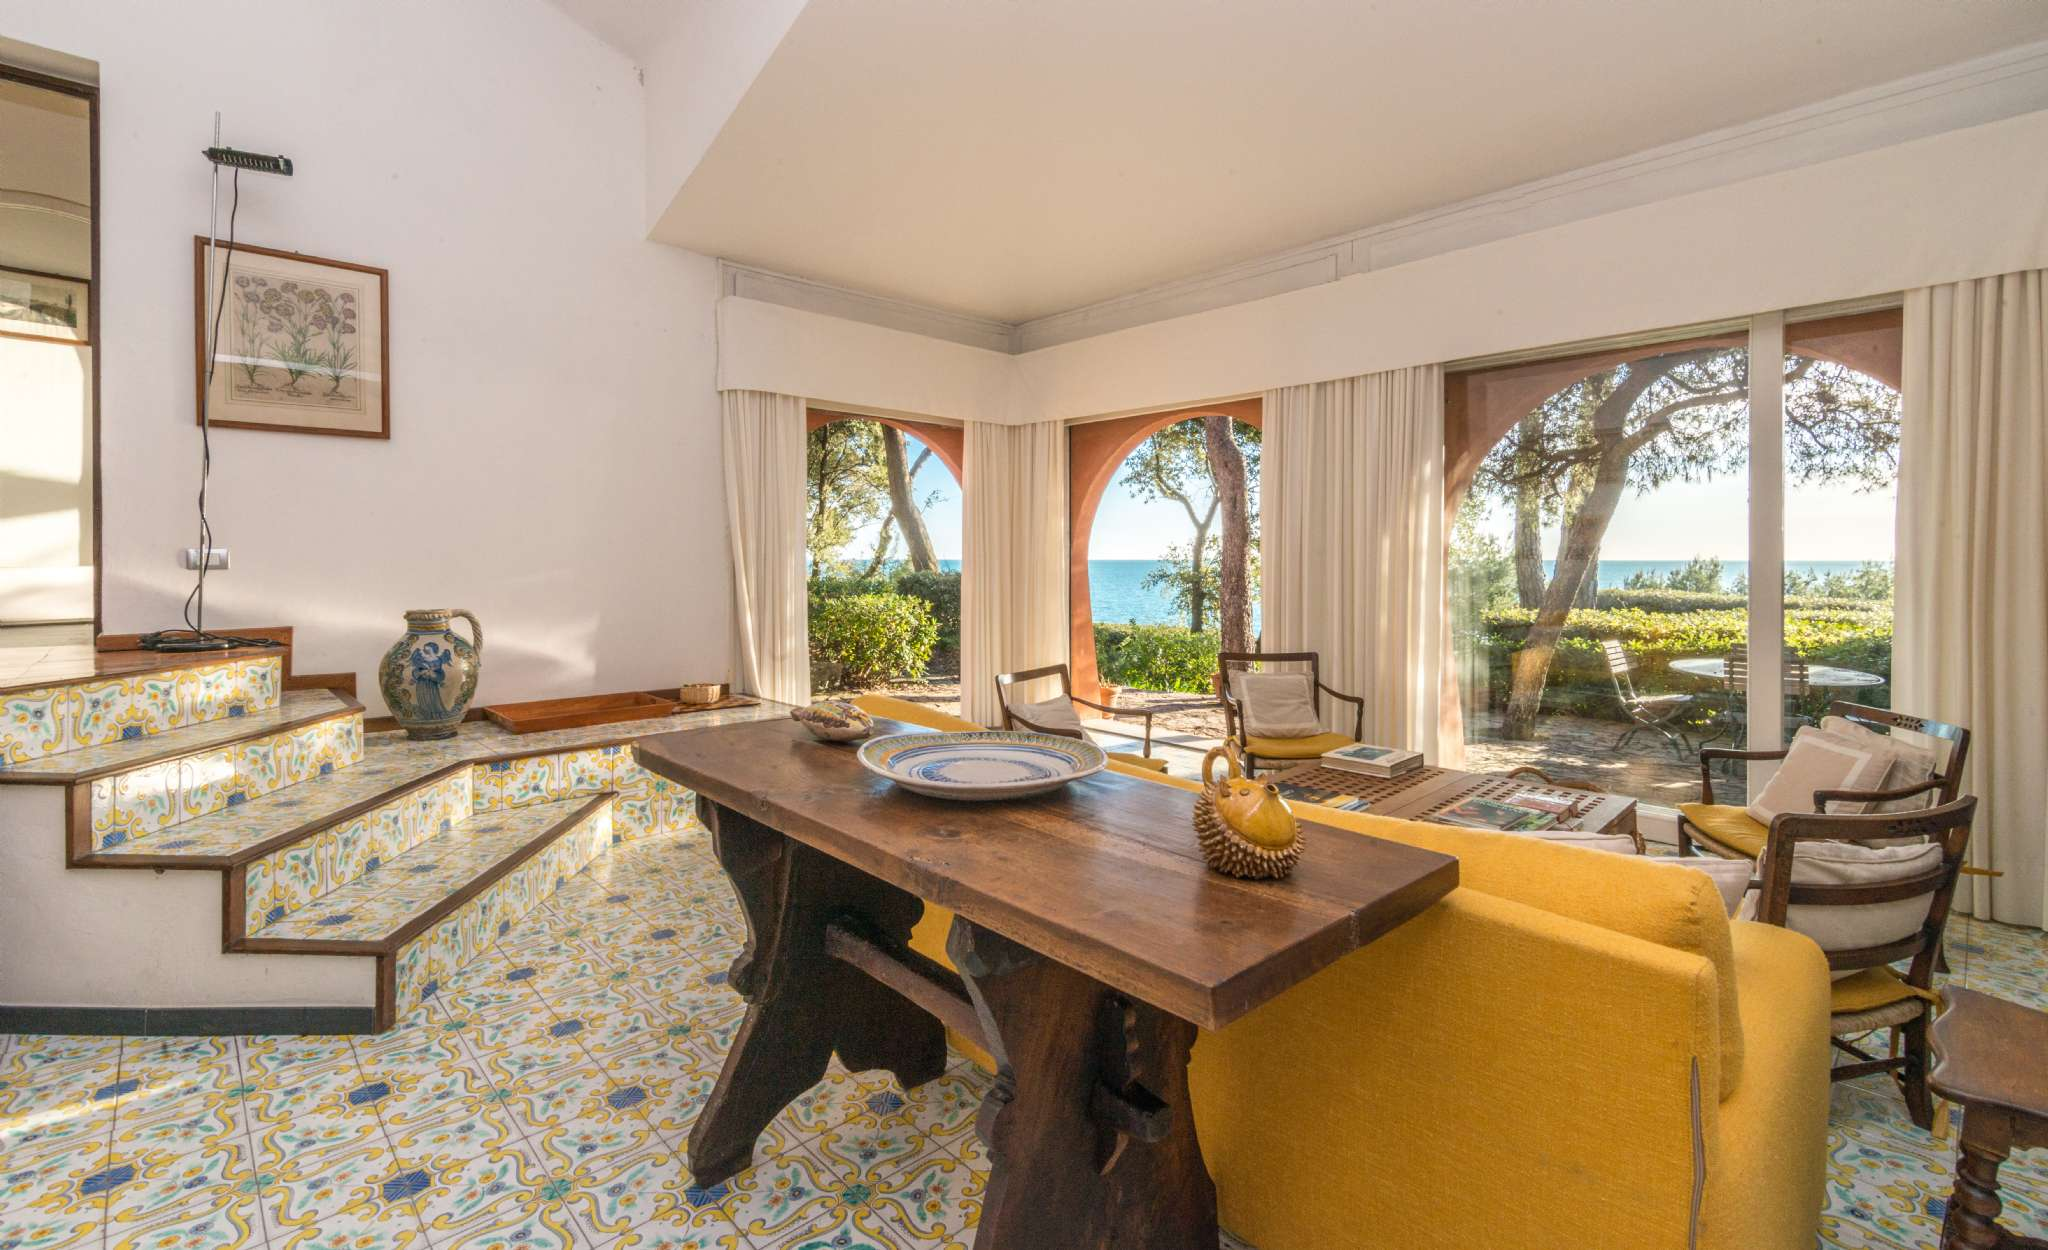 Villa in Vendita a Lerici: 5 locali, 340 mq - Foto 8